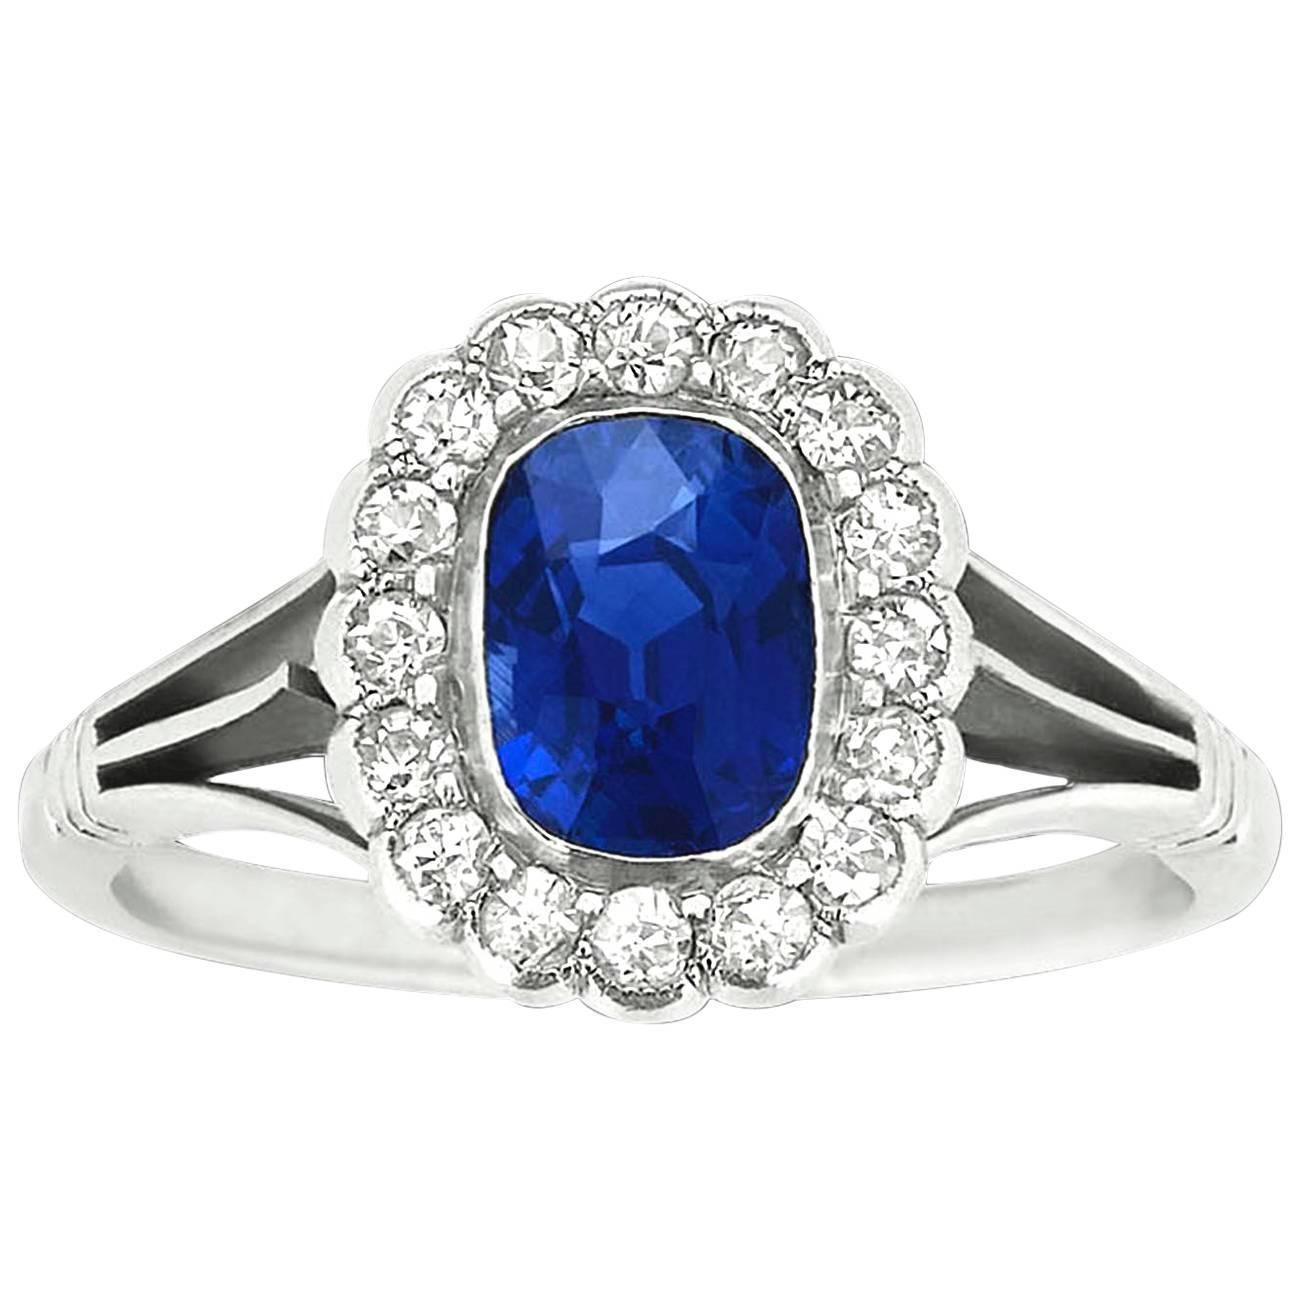 1.37 Carat Untreated Kashmir Sapphire Diamond Platinum ...